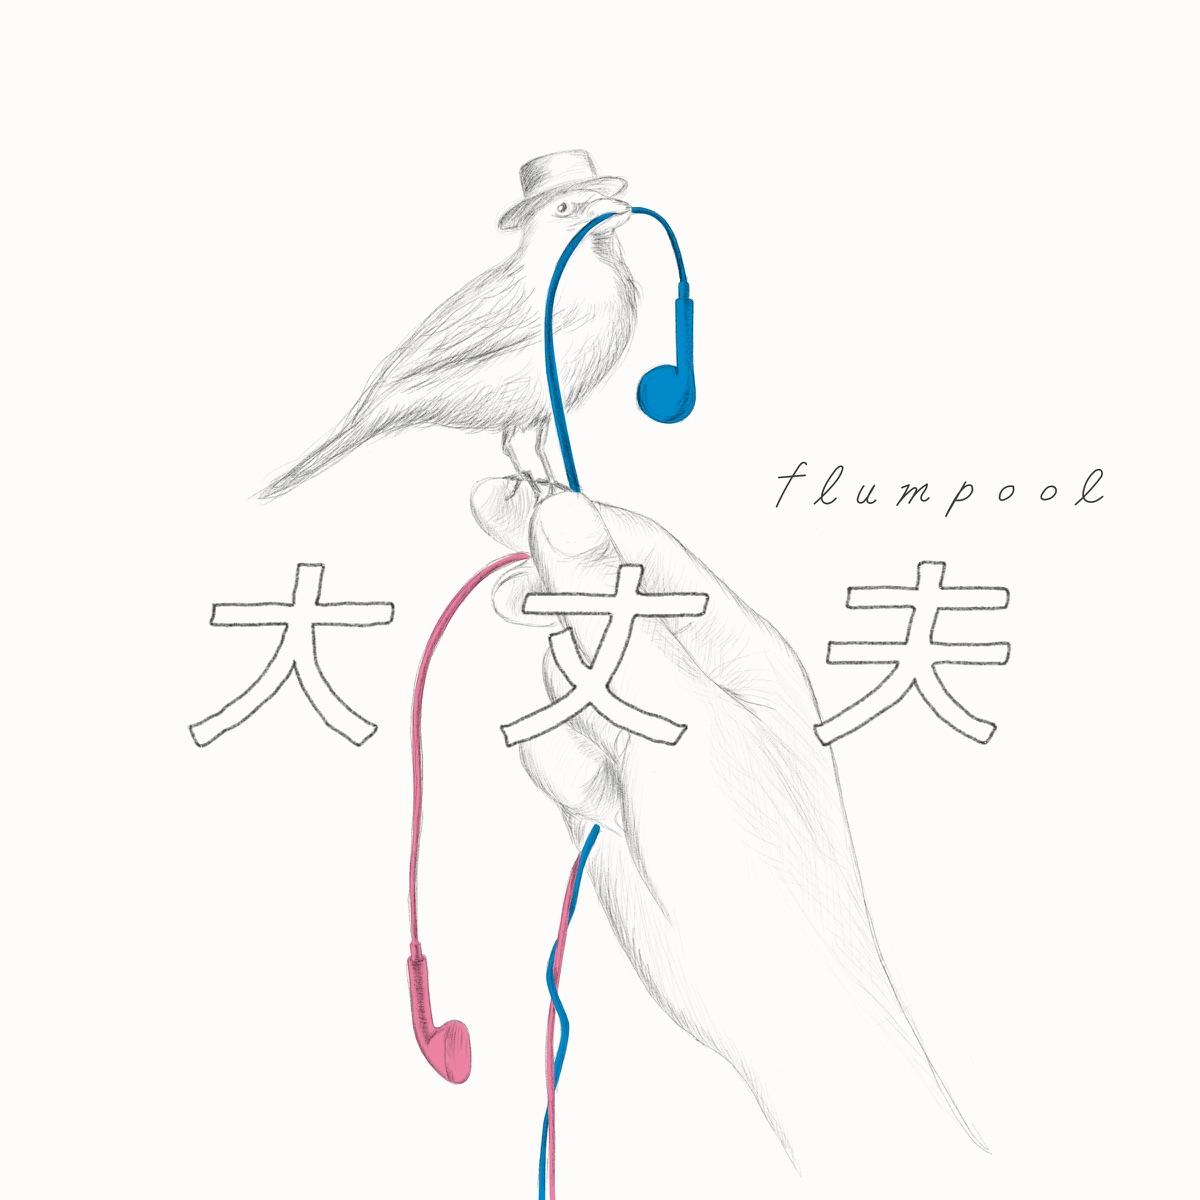 『flumpool - 大丈夫』収録の『大丈夫』ジャケット